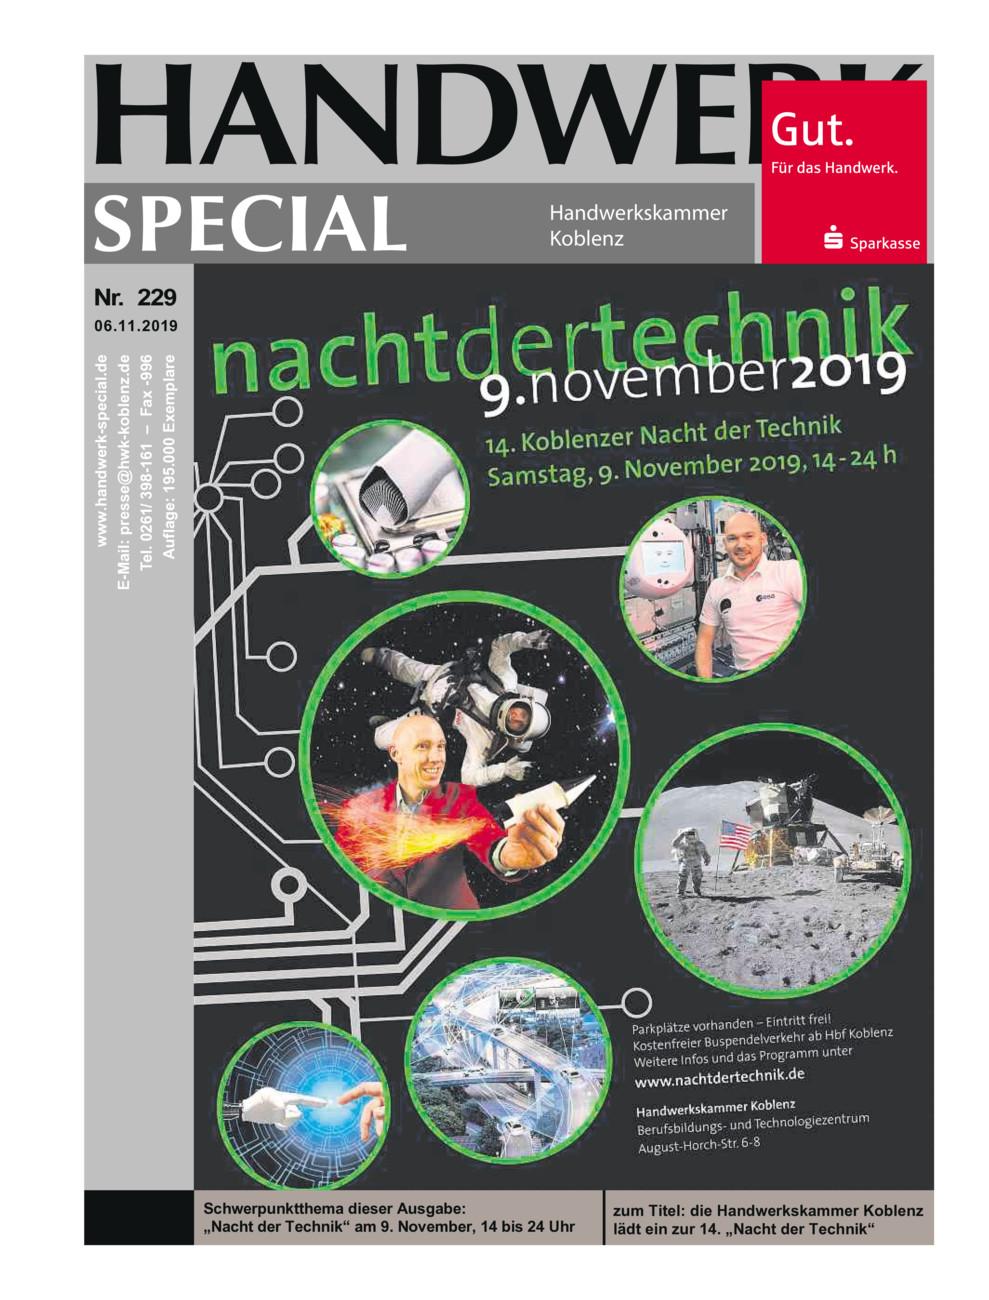 Handwerk Spezial 229